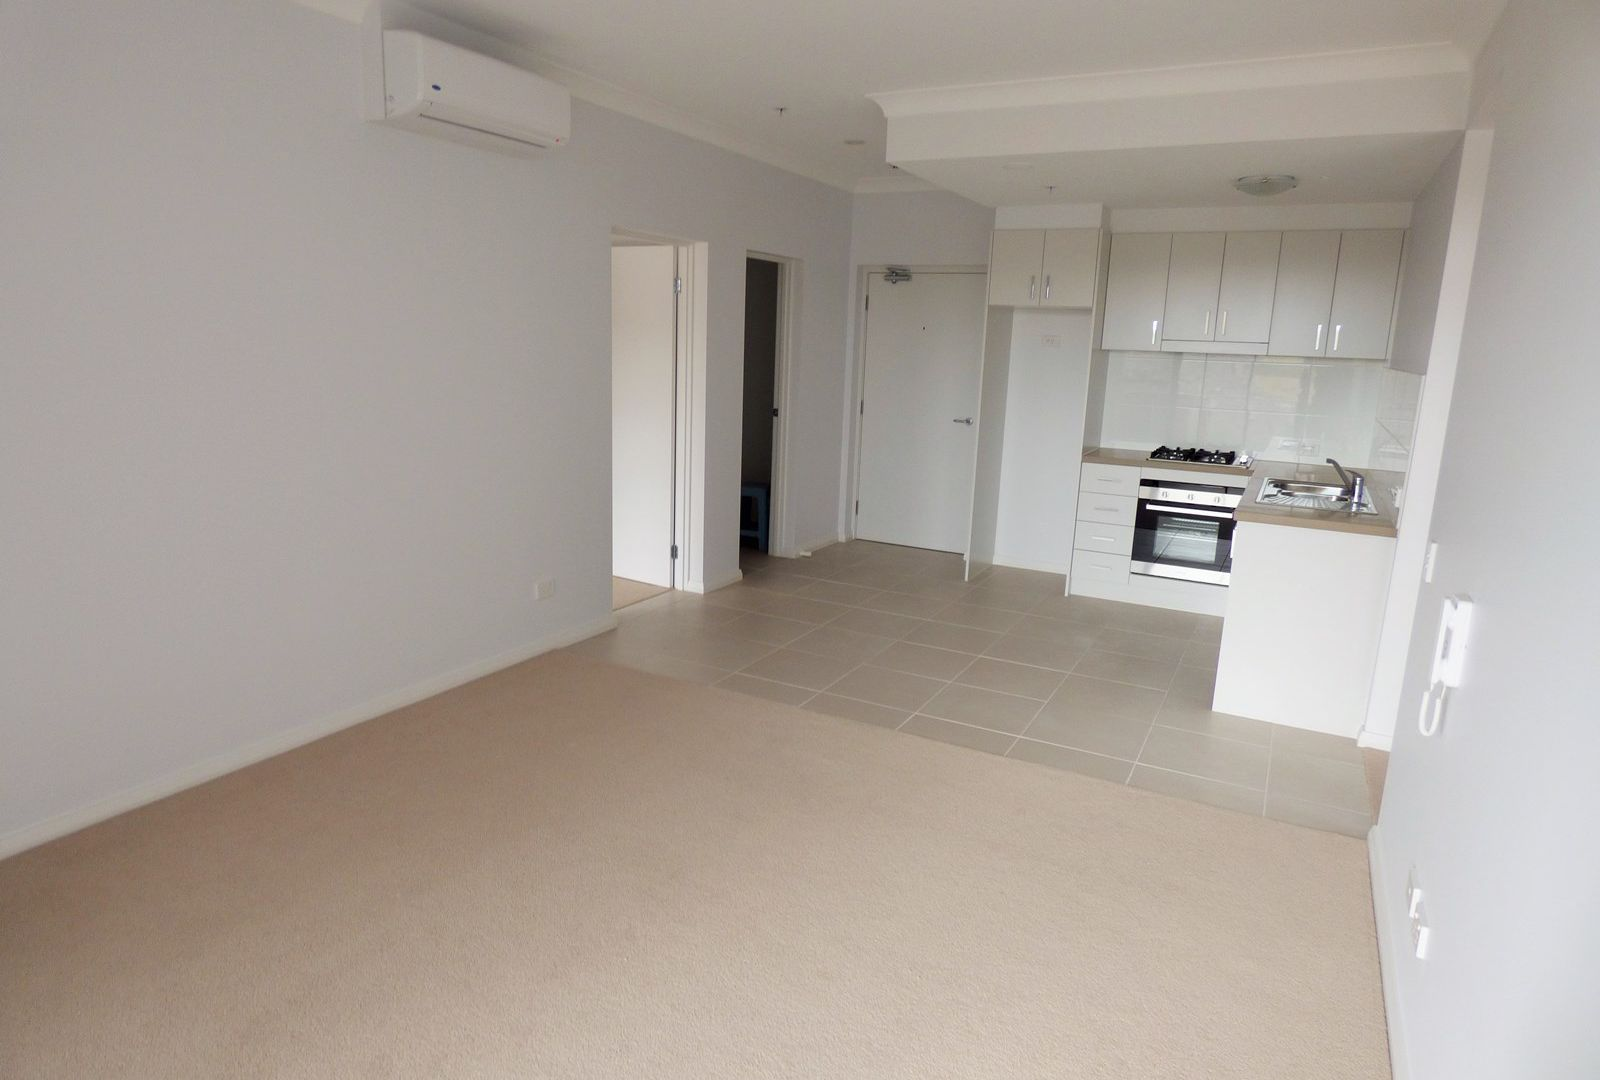 12/110 Kellicar Road, Campbelltown NSW 2560, Image 2